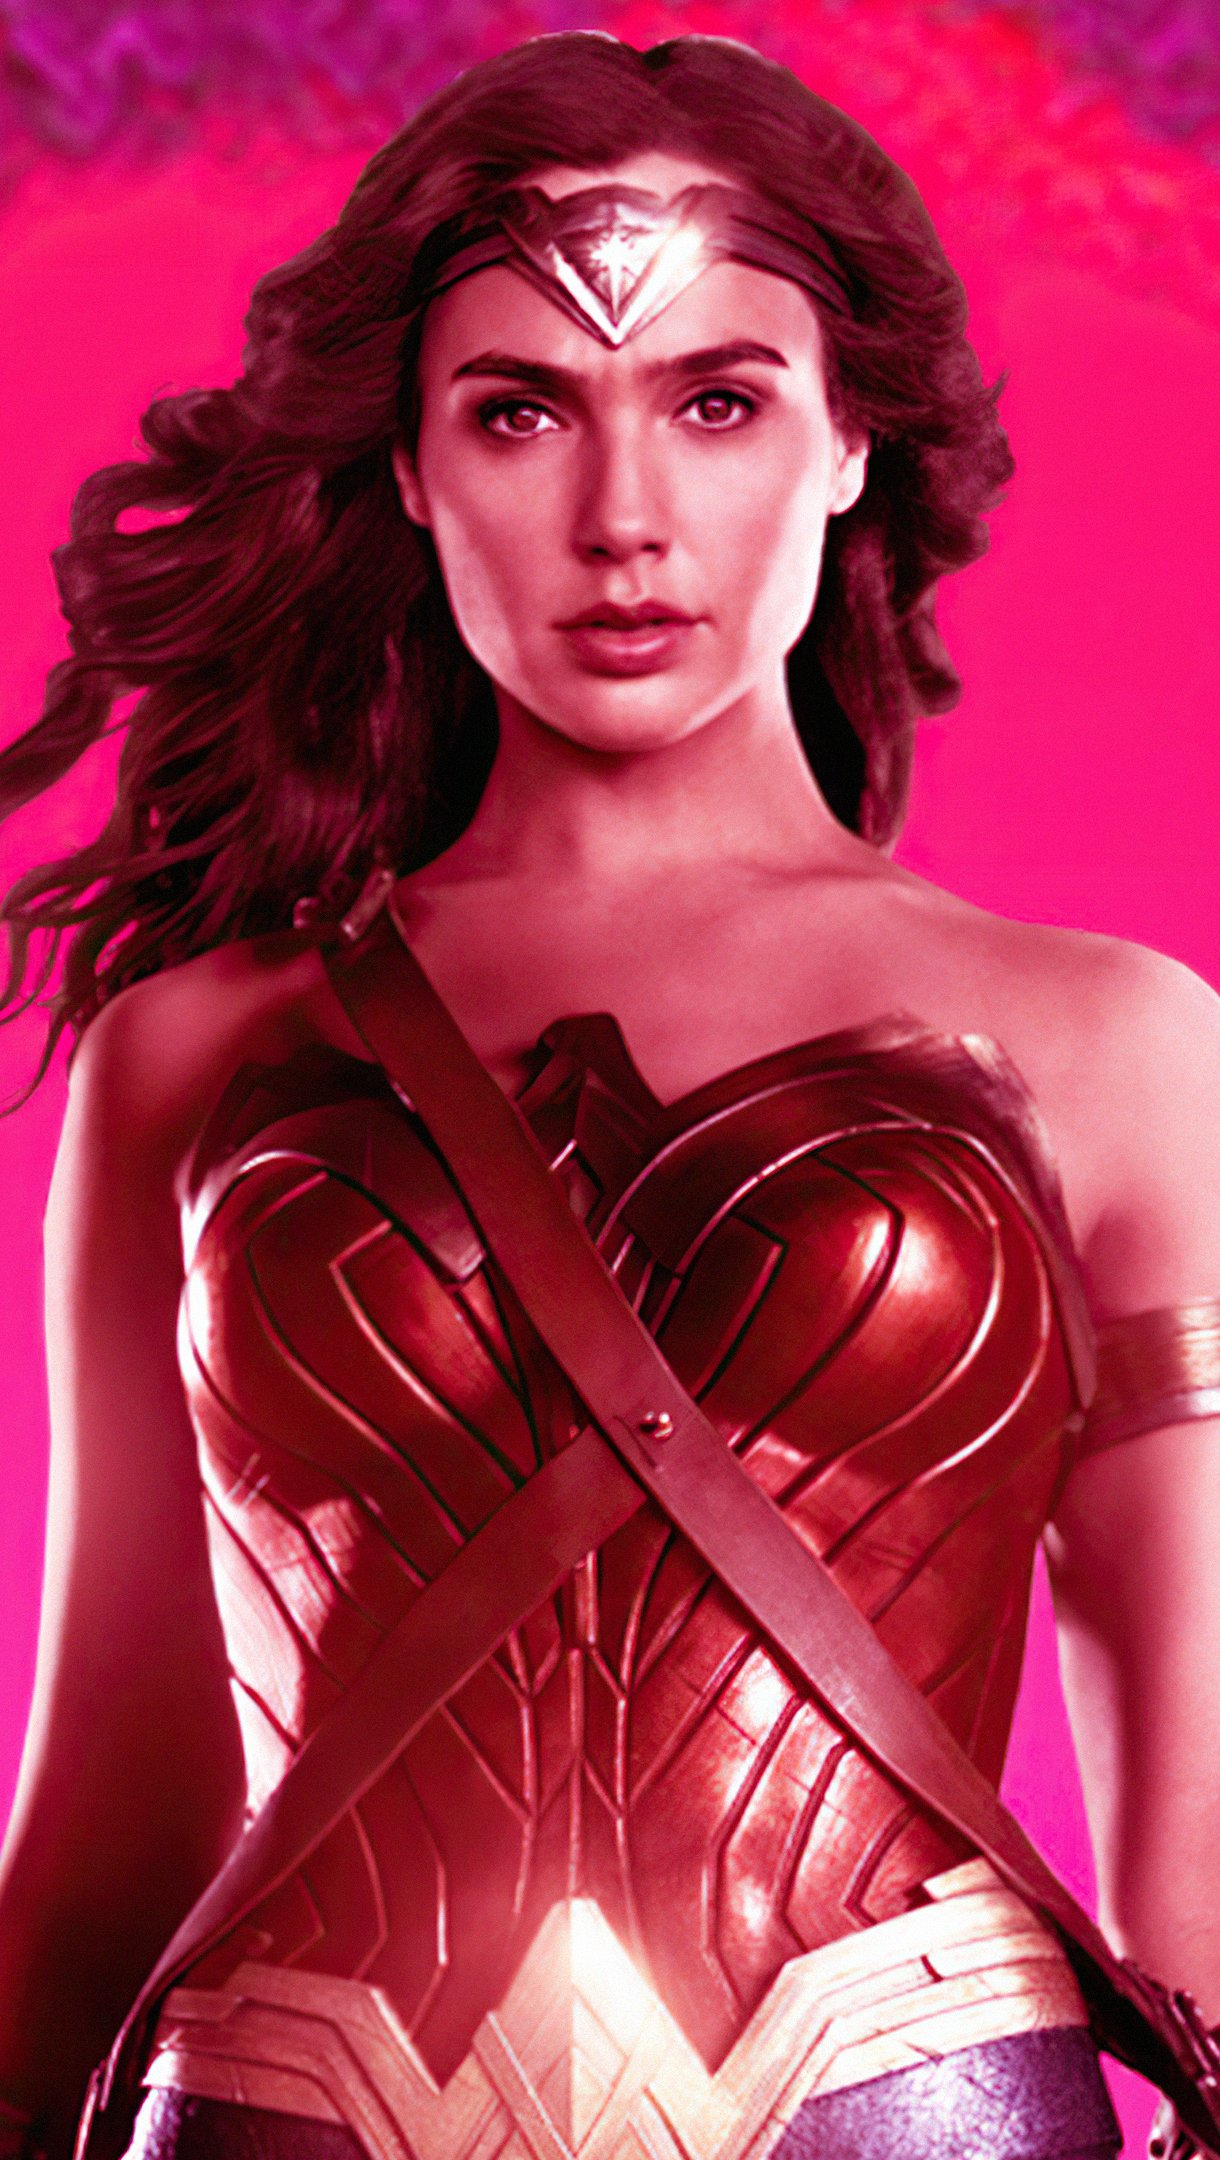 Wallpaper Wonder Woman 84 Retro Vertical